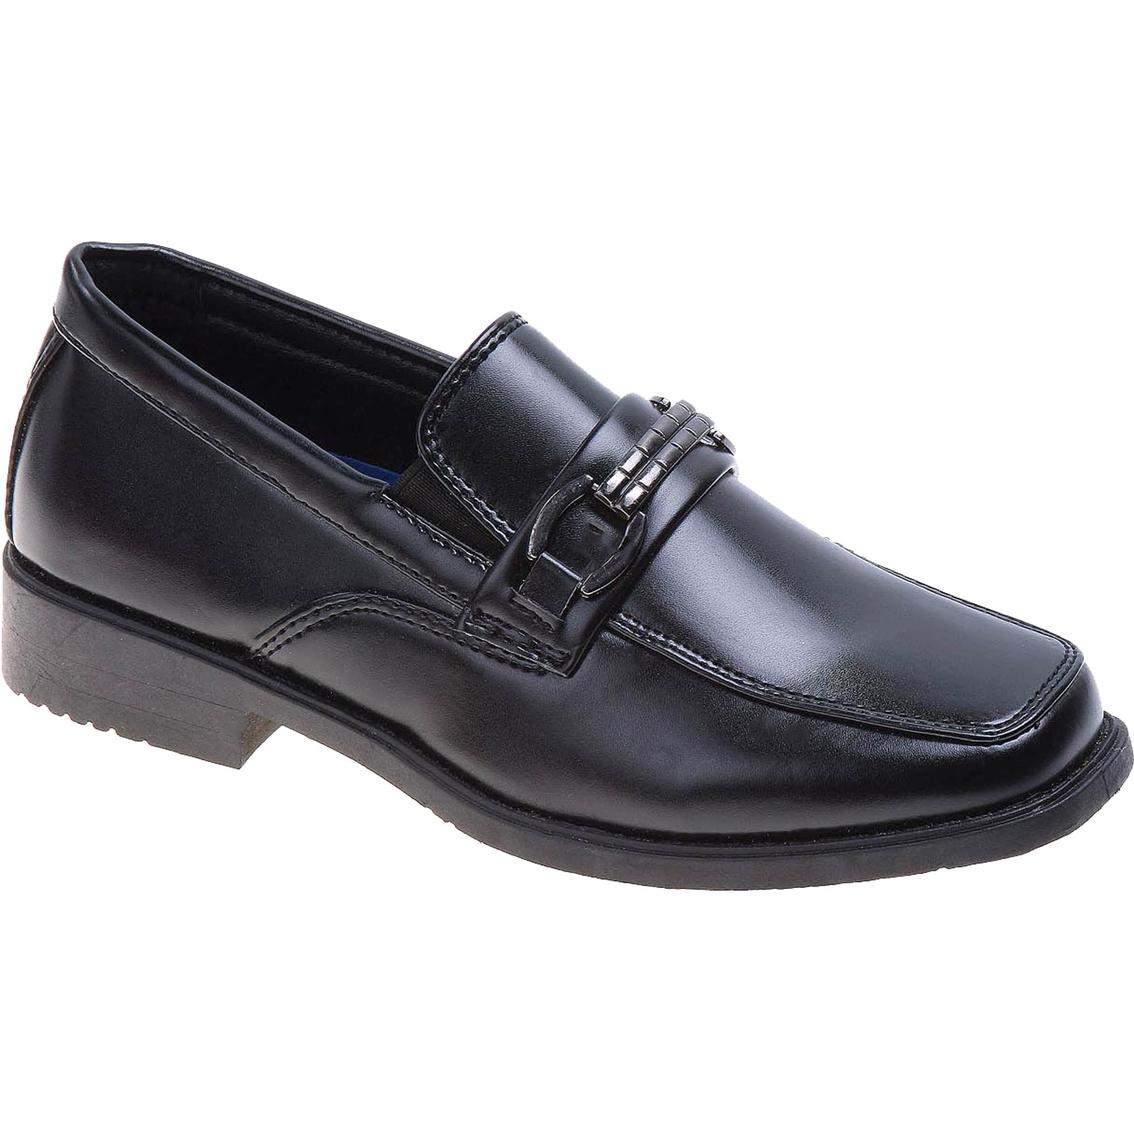 Josmo Boys Dress Shoes   Dress   Shoes